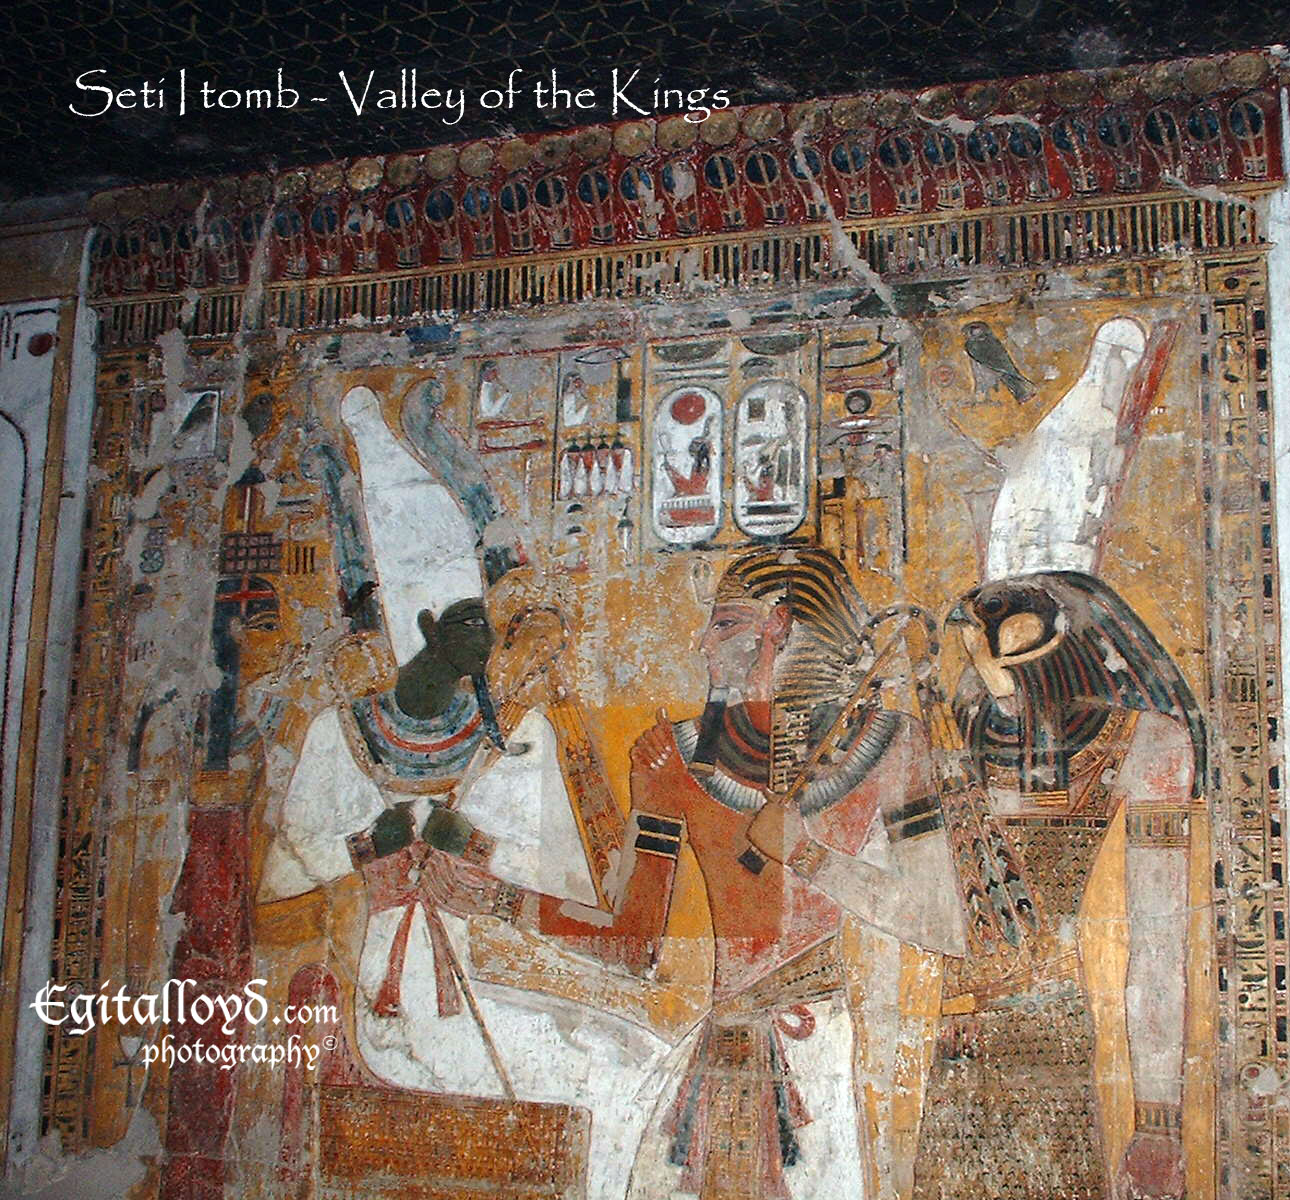 Egitalloyd Travel Egypt: KING SETI I: Father & Son of Ramesses